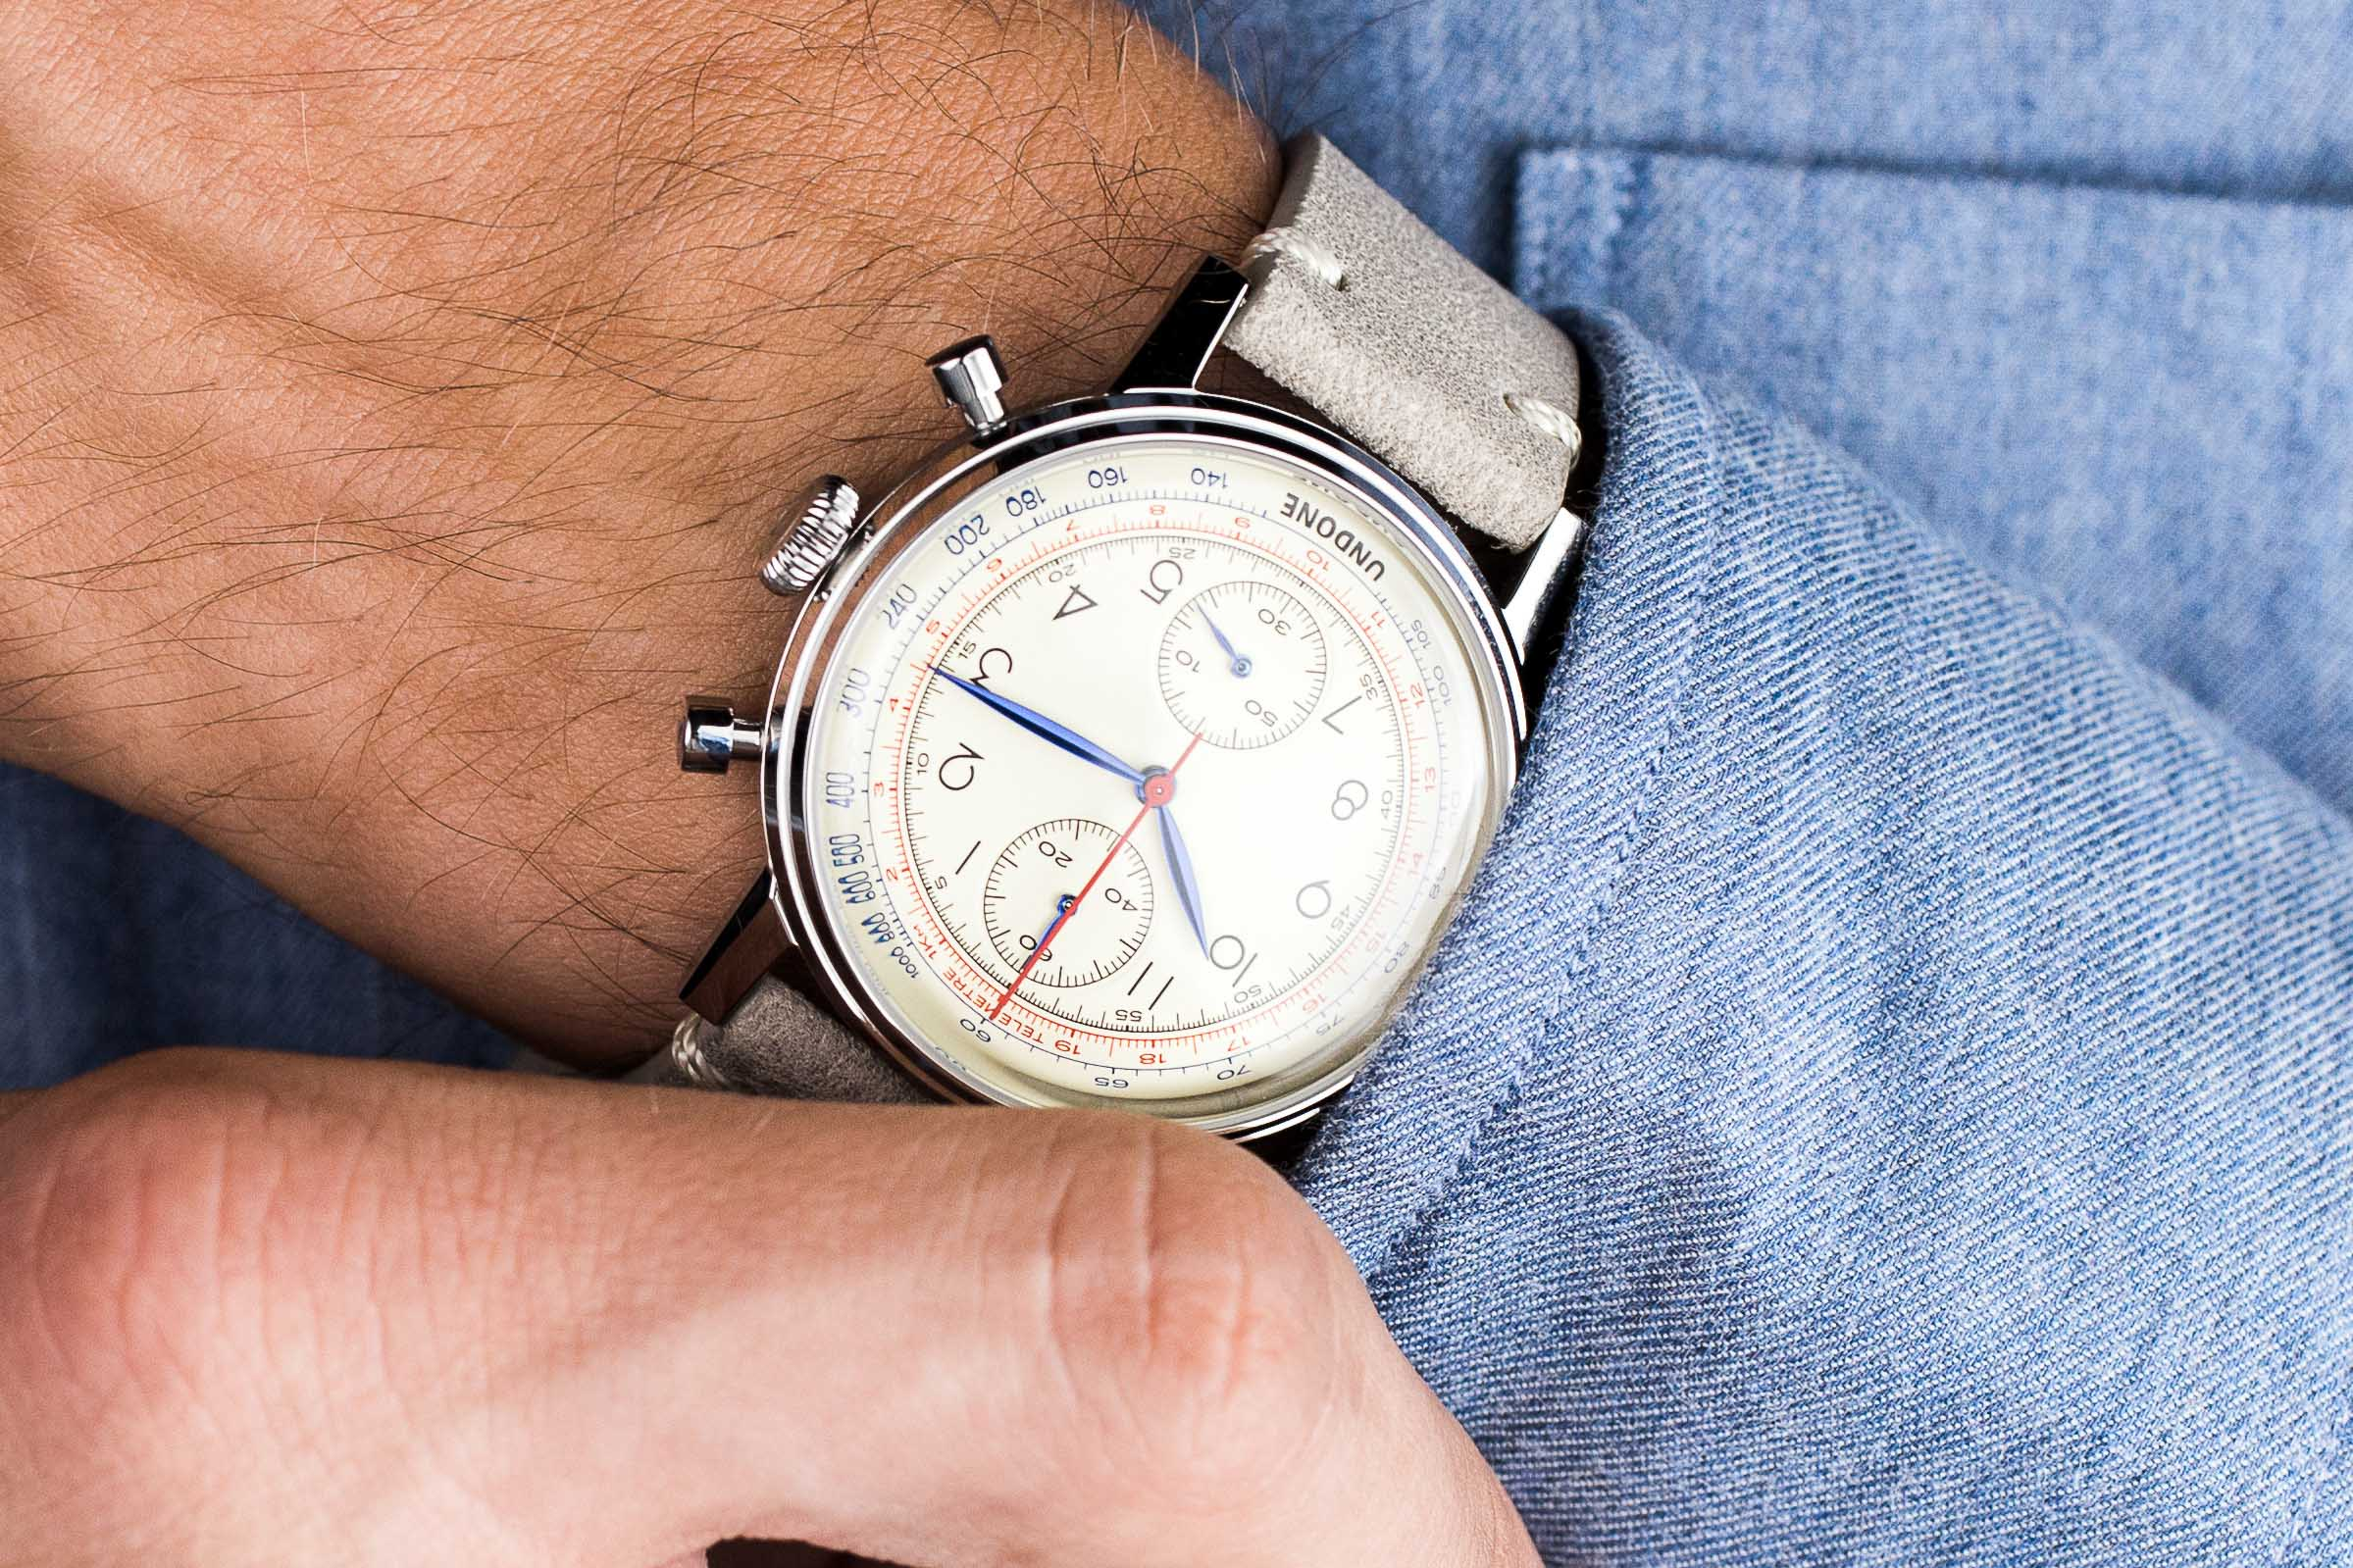 Undone Urban Vintage Killy on wrist